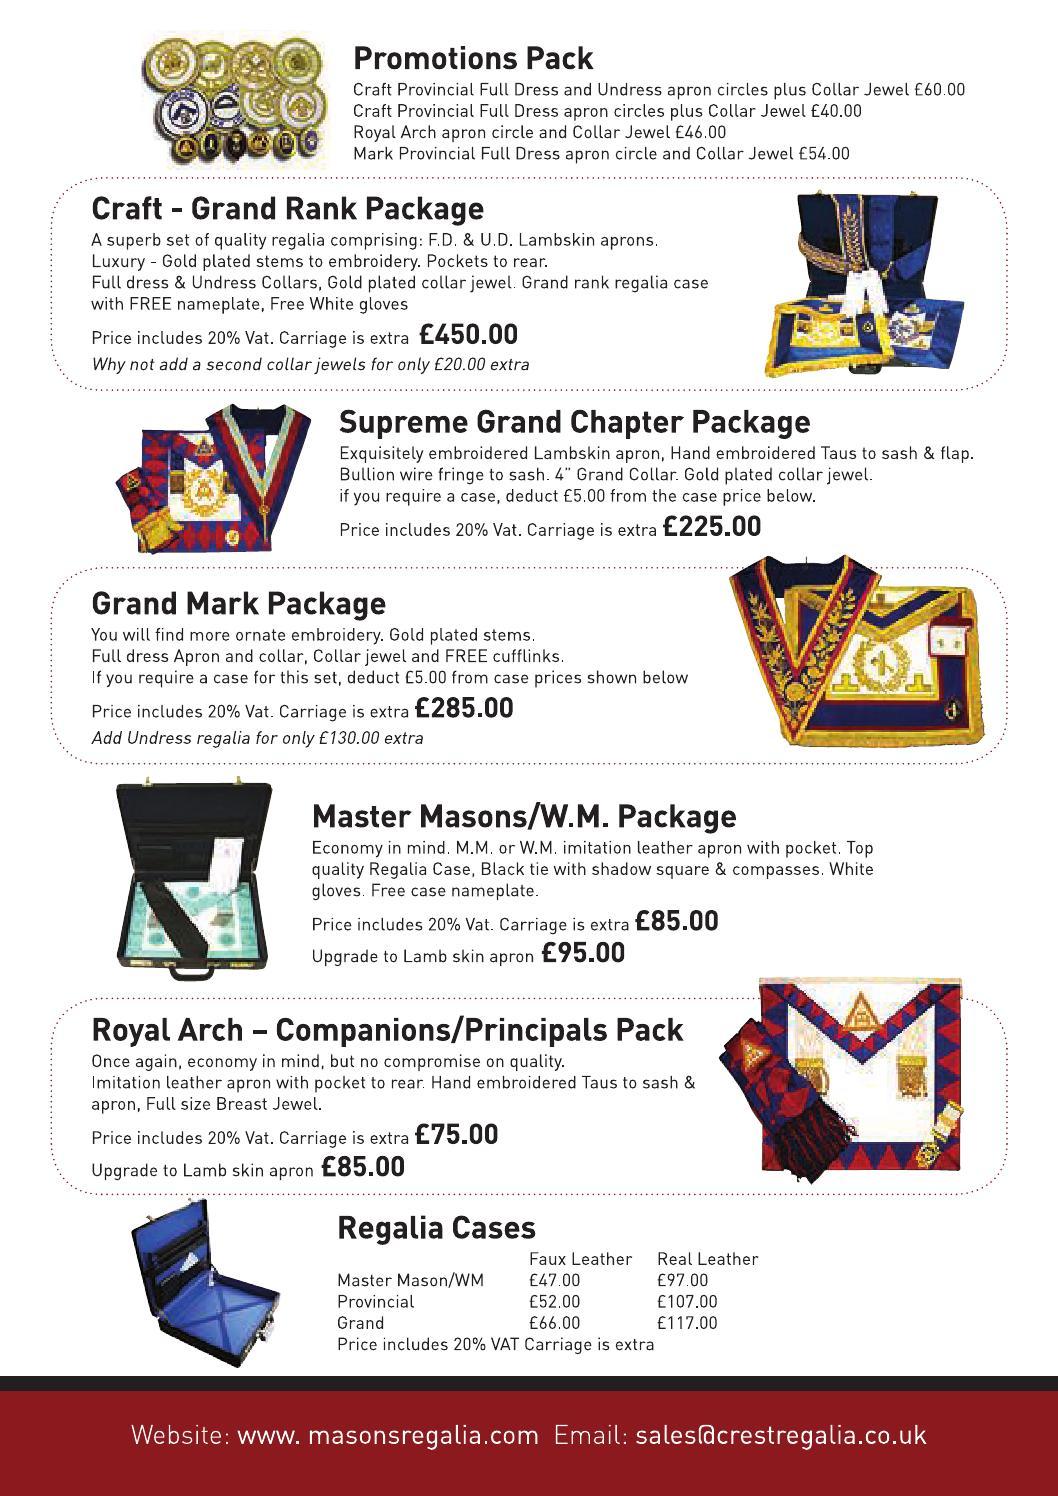 White lambskin apron - Freemasonry Today Spring 2016 Issue 33 By Freemasonry Today Issuu